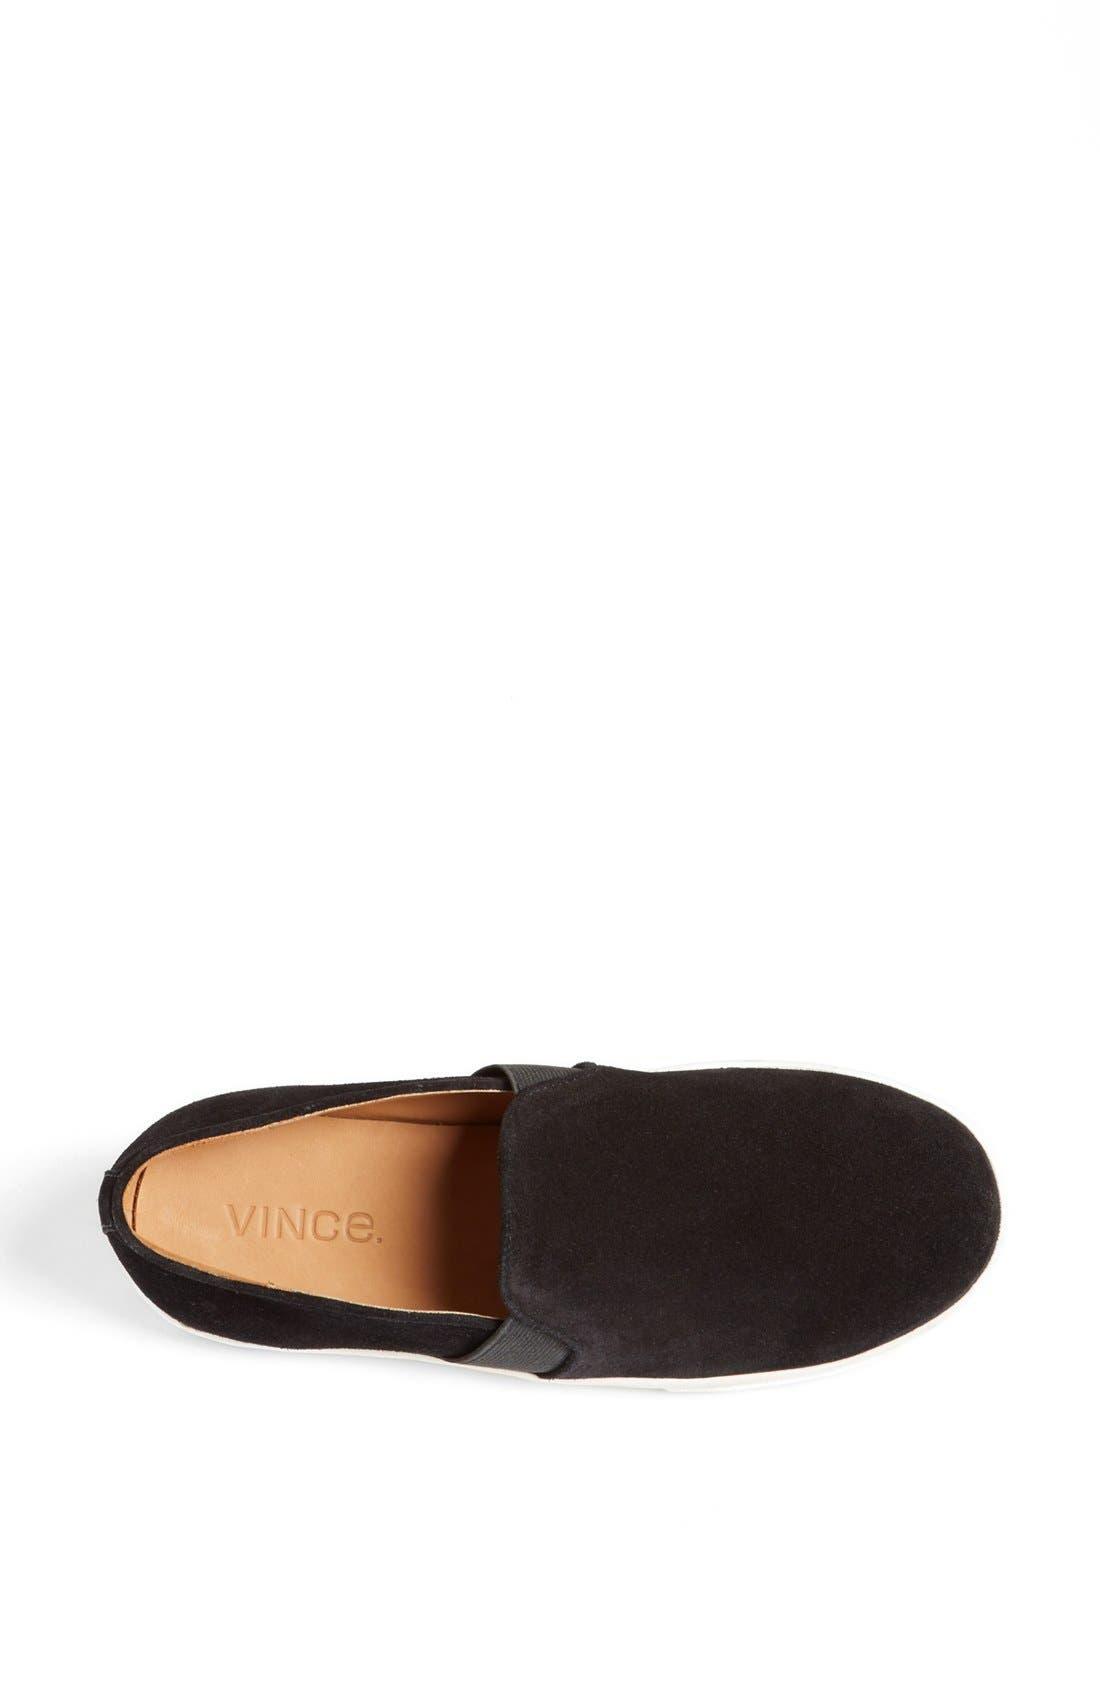 'Blair 3' Sneaker,                             Alternate thumbnail 3, color,                             Black